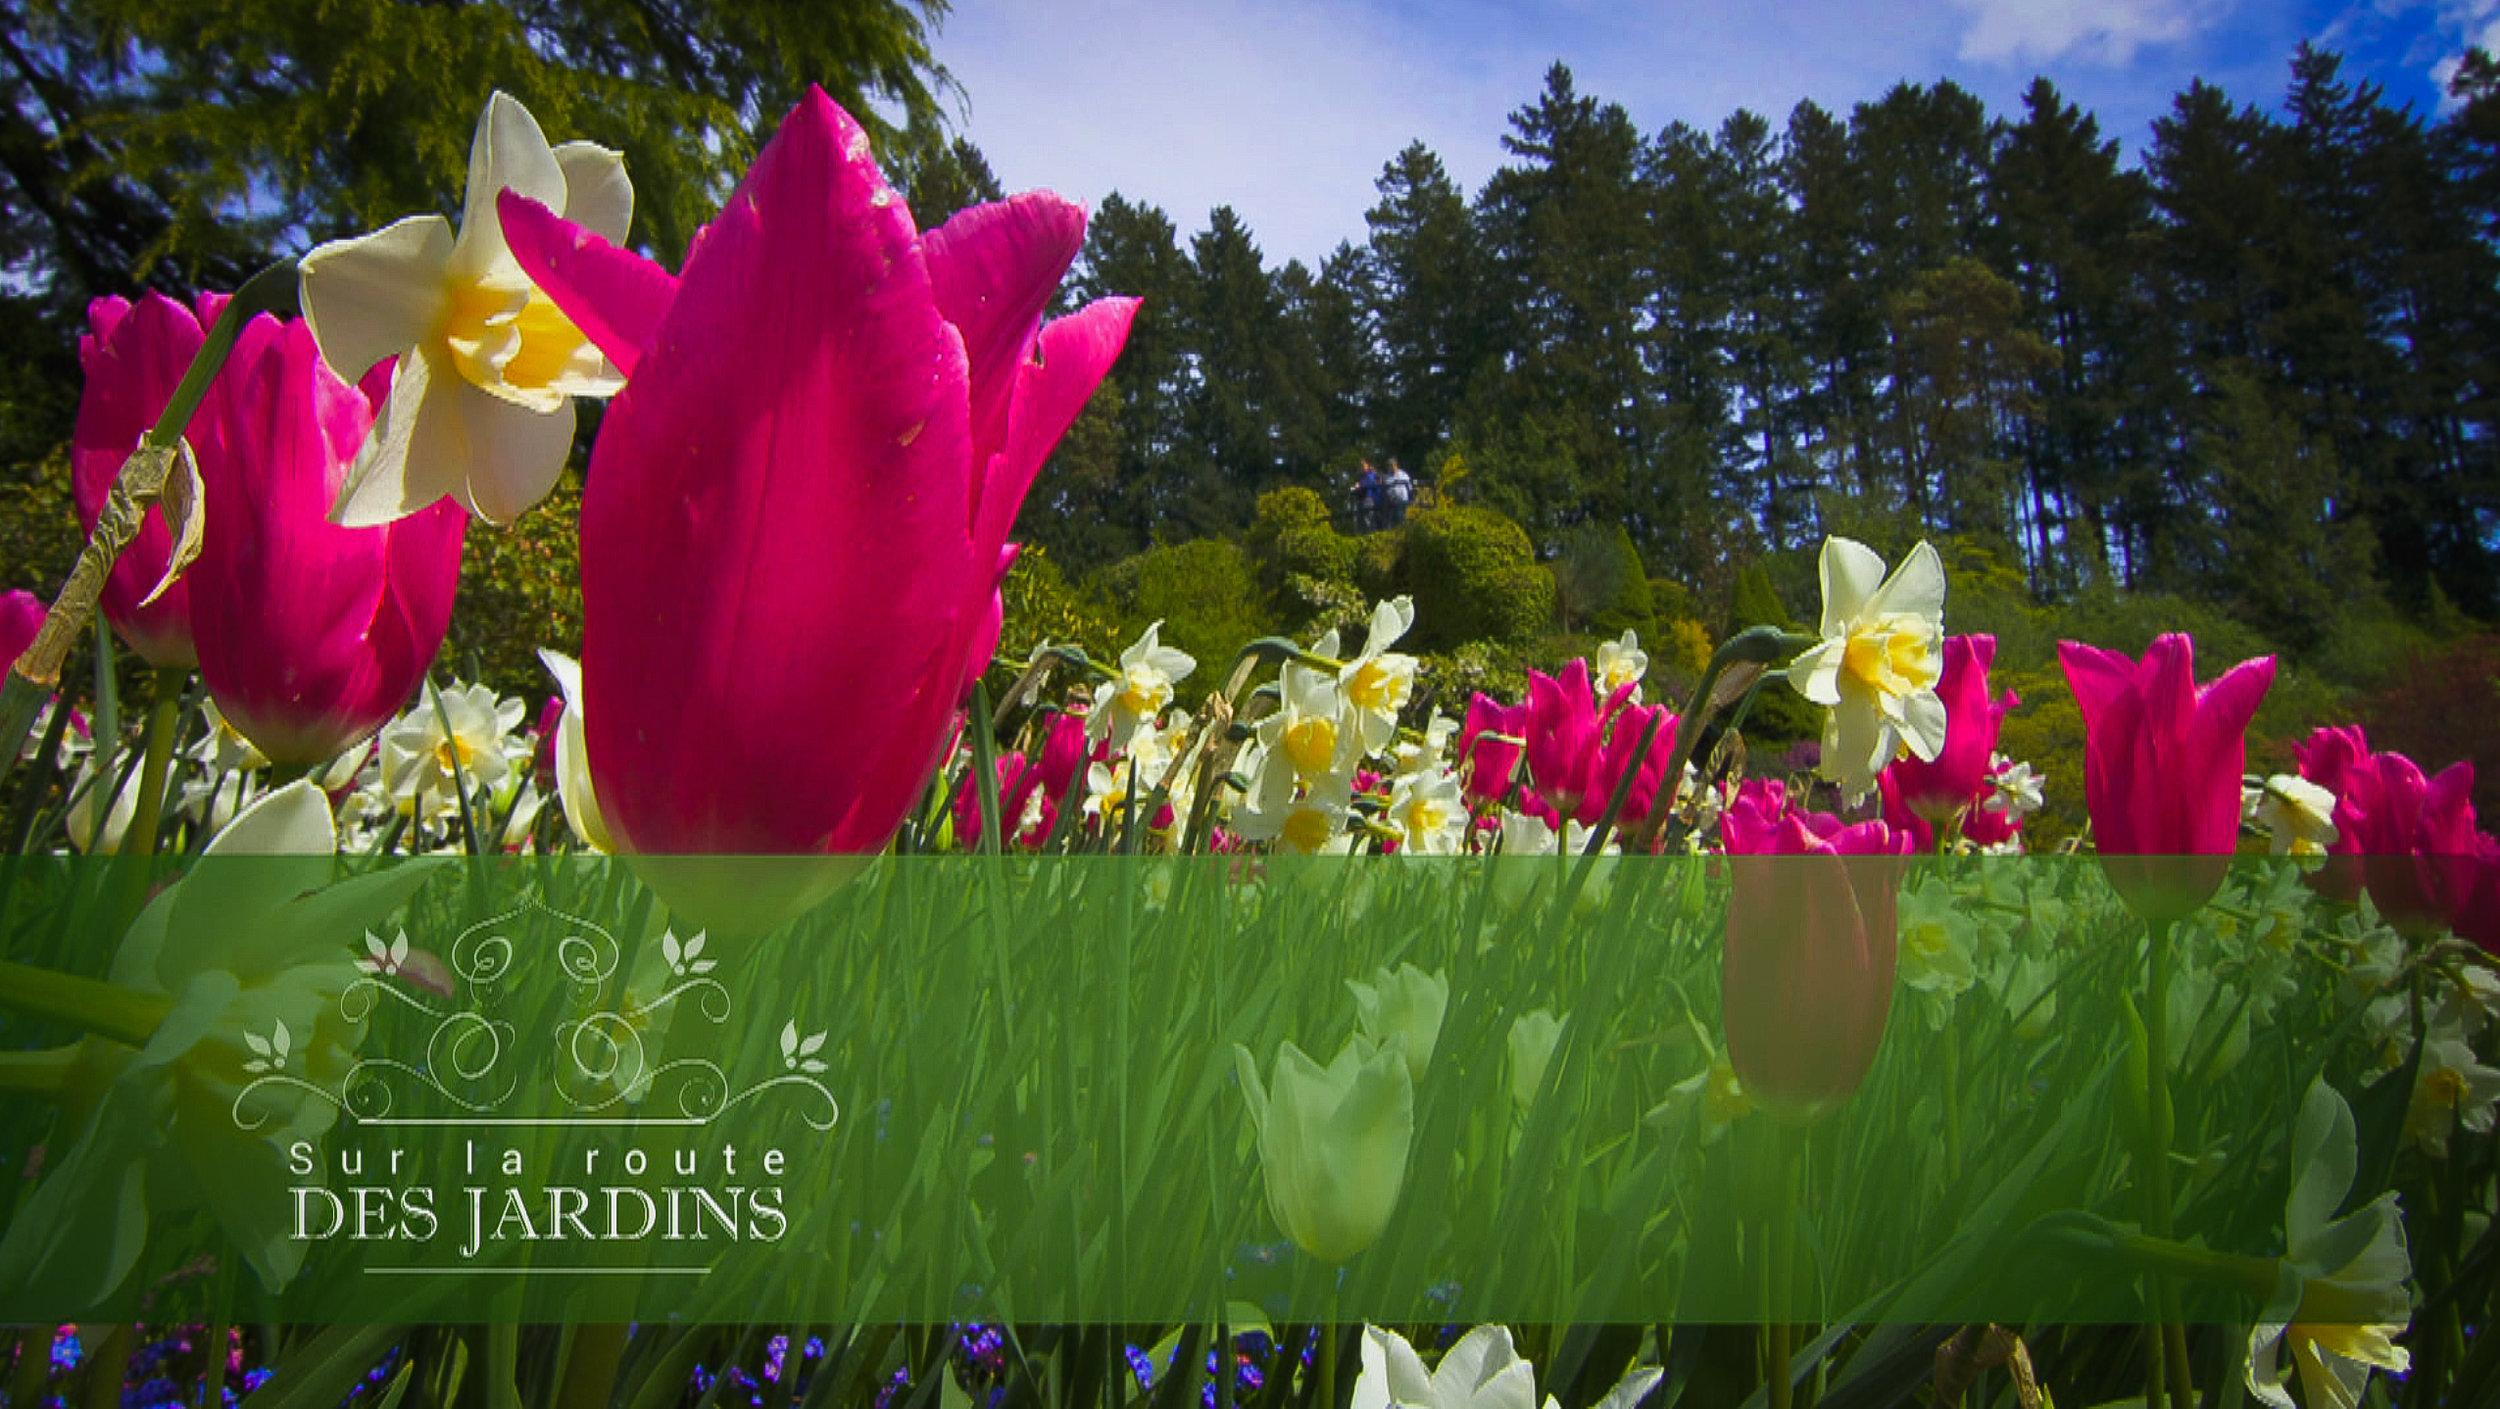 Jardins Screen shots-8.jpg